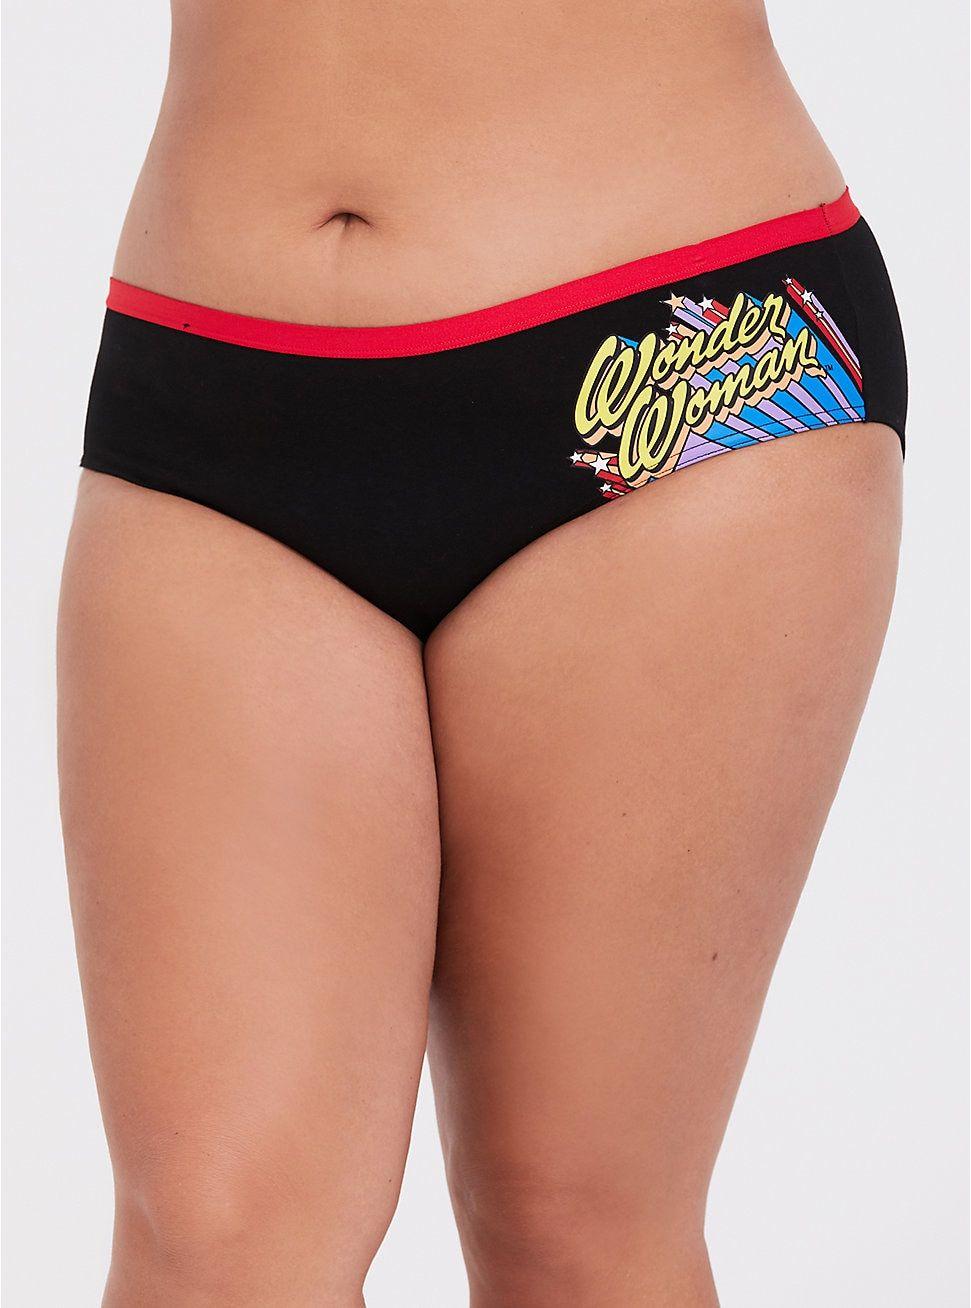 645448556de Wonder Woman Cotton Hipster Panty in 2019